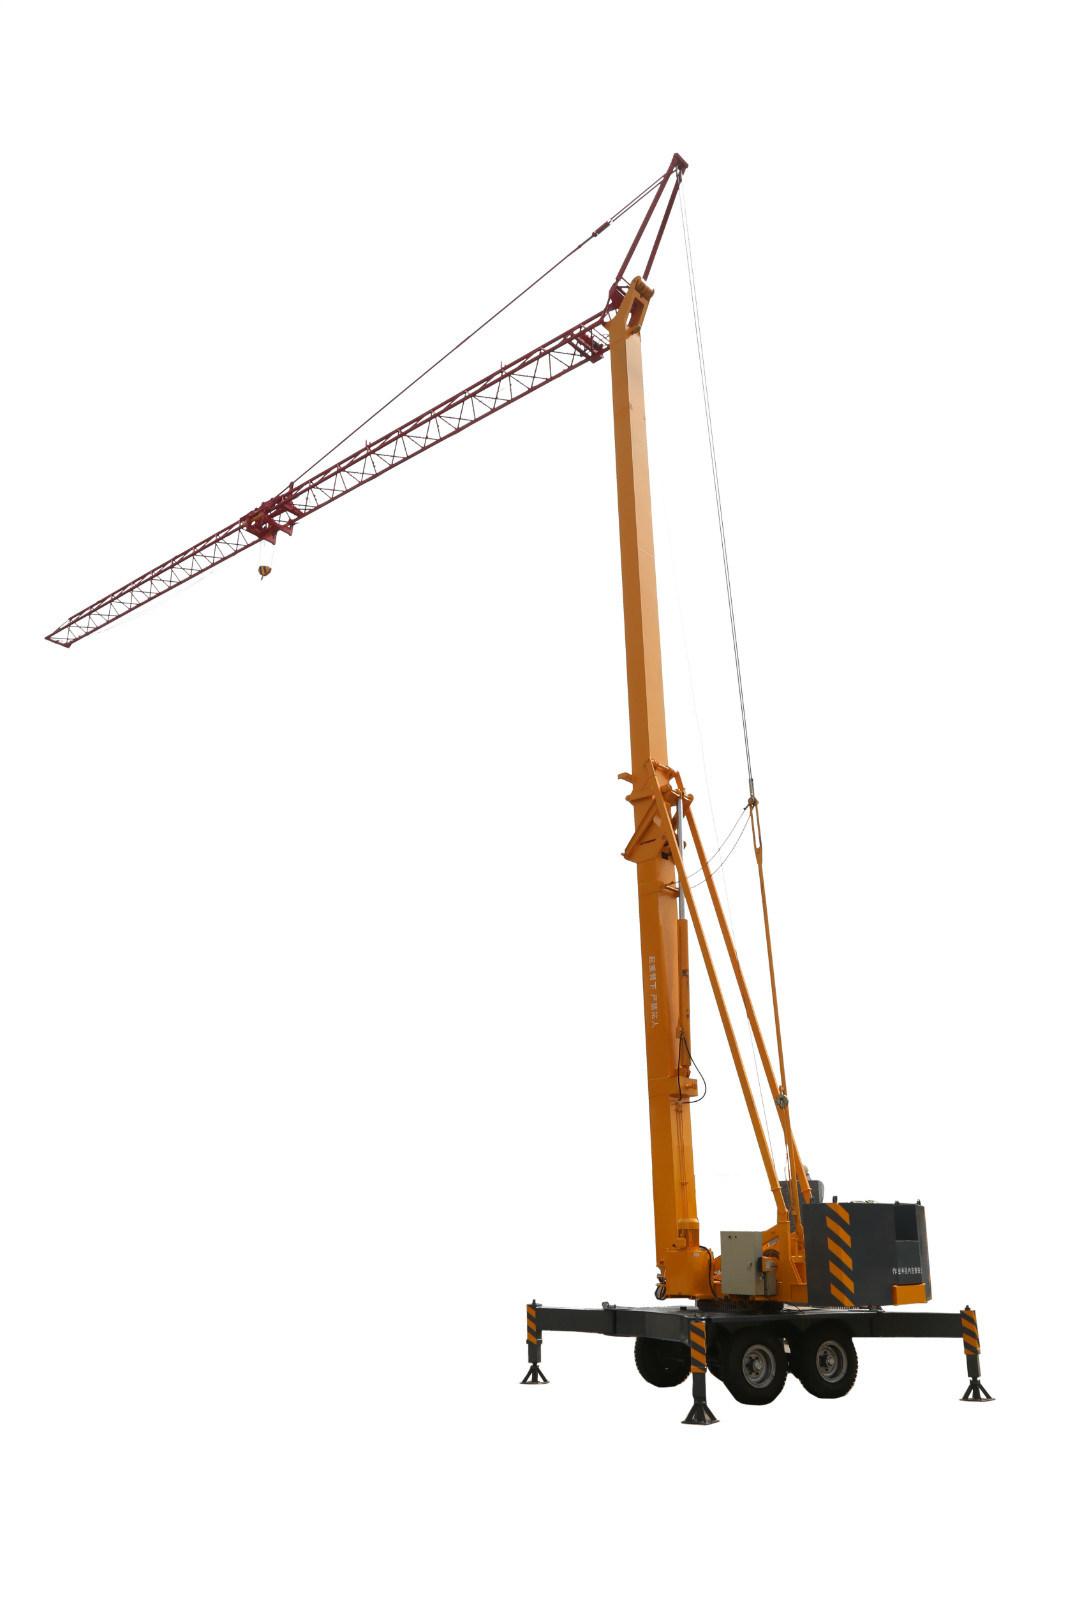 Mobile Foldingtower Crane for Lifting Heavy Stuff